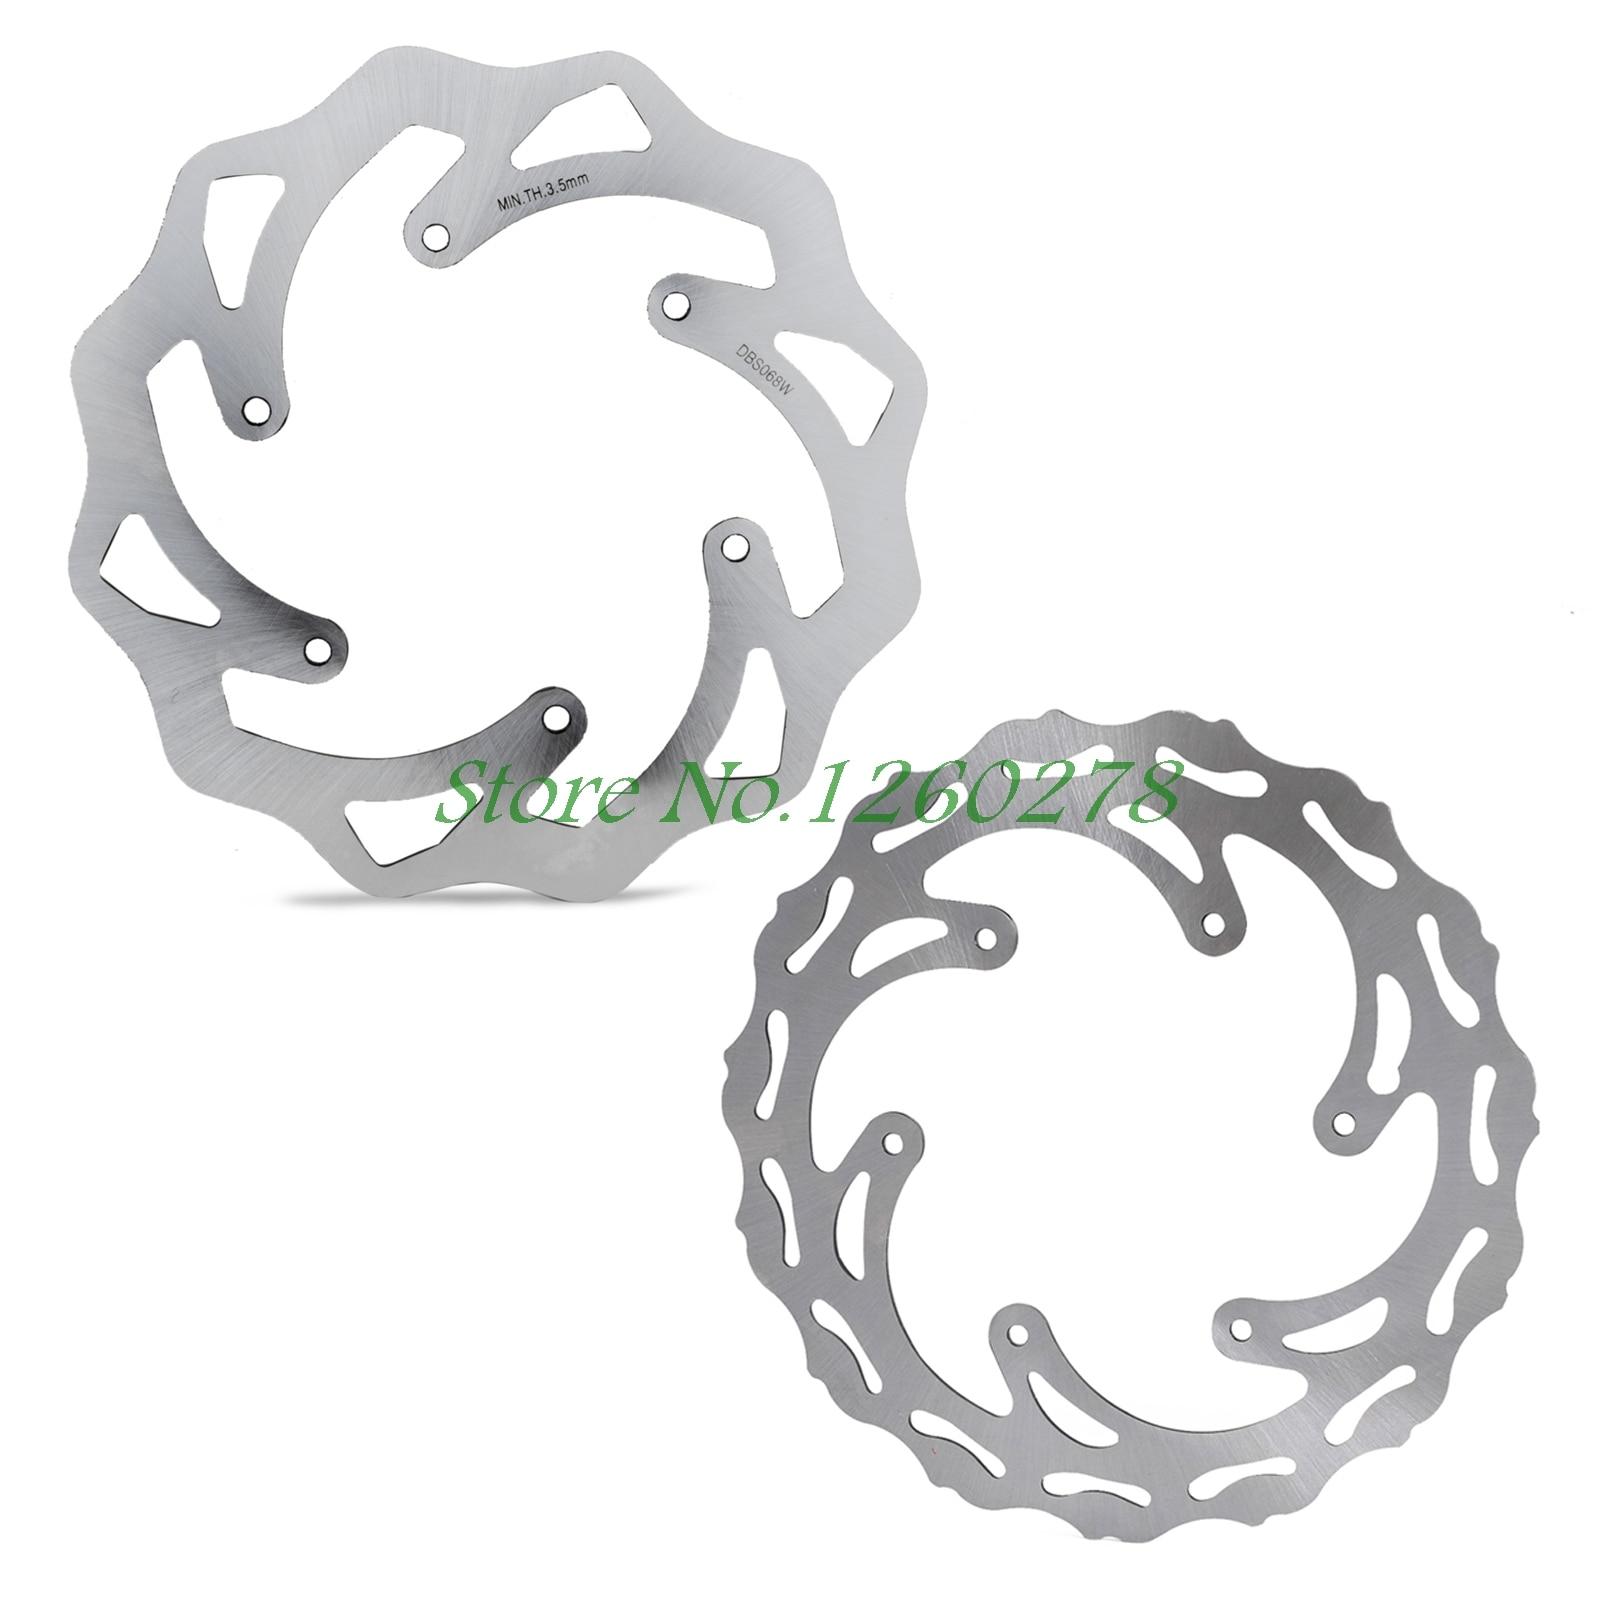 Motorcycle 260/220mm Front Rear Brake Discs Rotors For KTM 125-500 All 1994-2018 Husqvarna 125-501 FE/TE/FC/TC Husaberg 560 570 воздуходув husqvarna 125 b